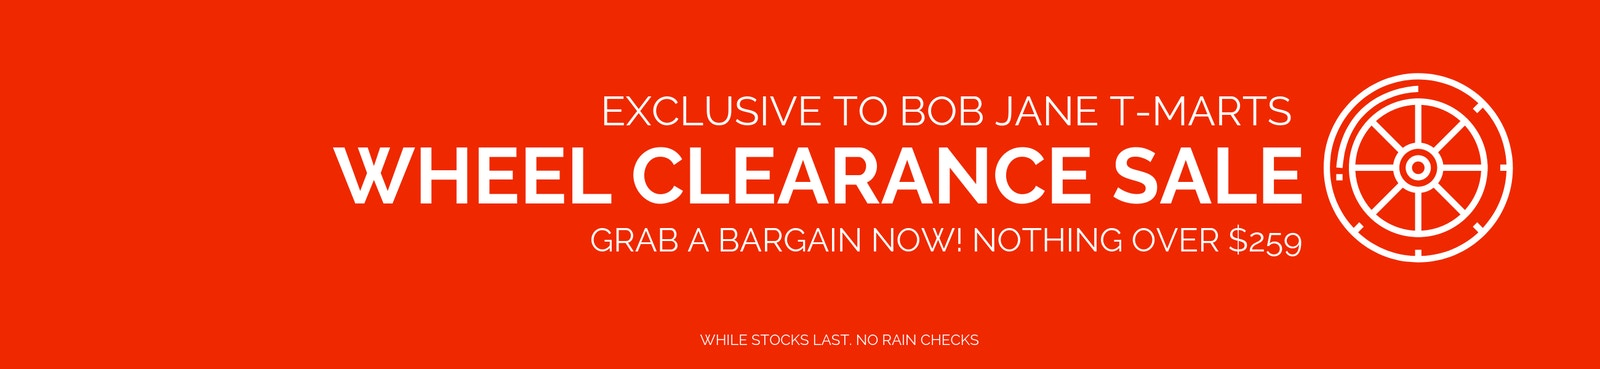 Wheels Clearance Sale